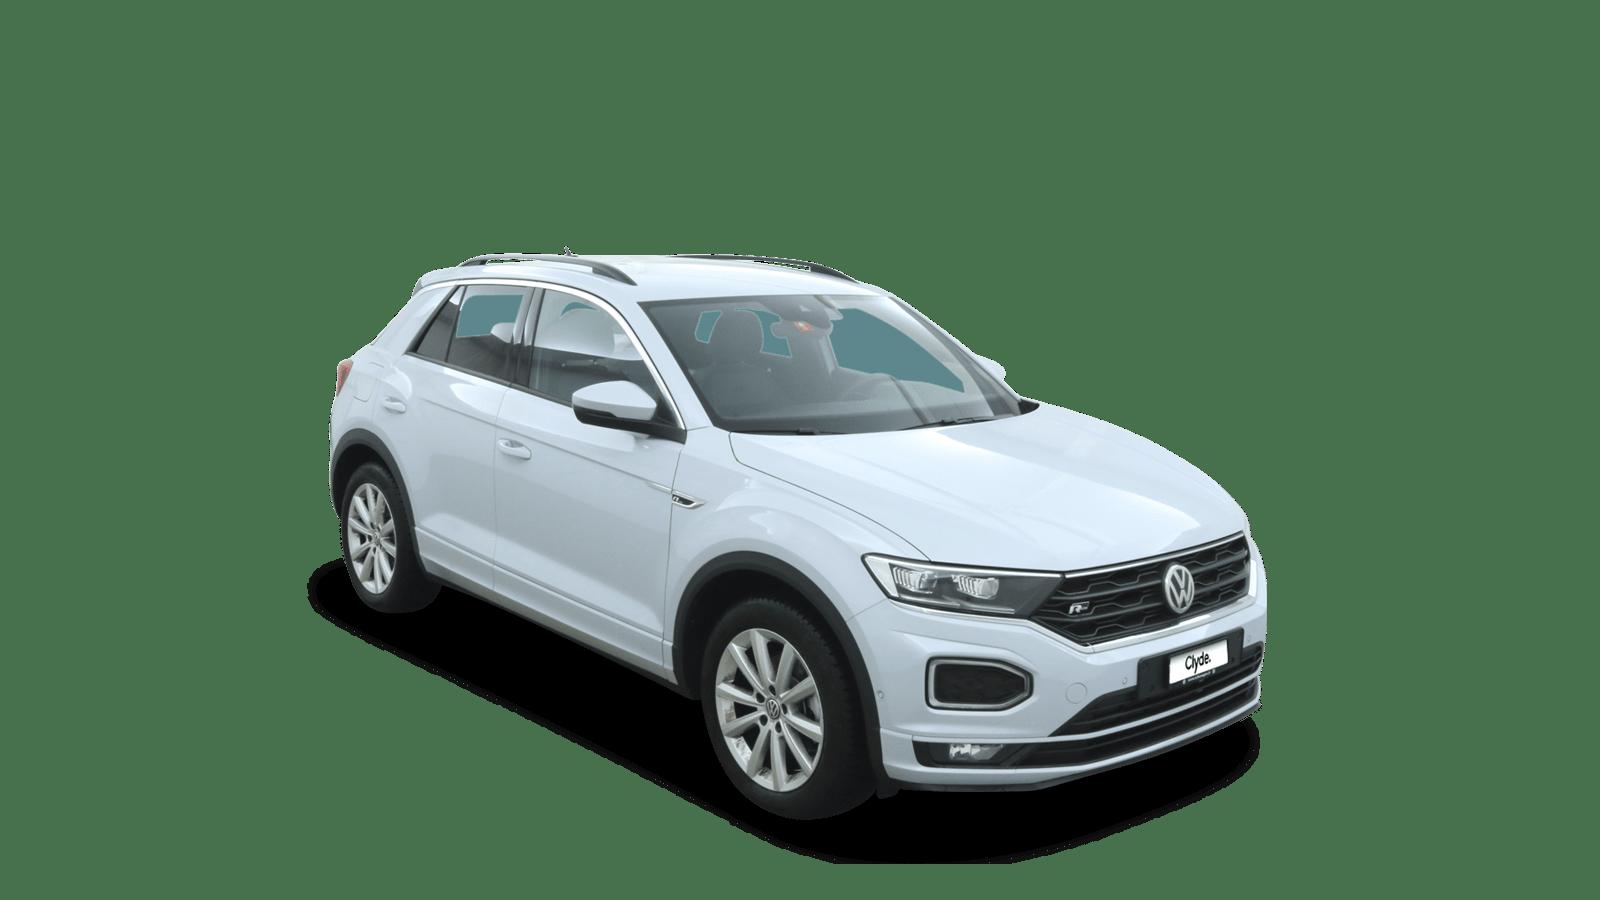 VW T-Roc White front - Clyde car subscription